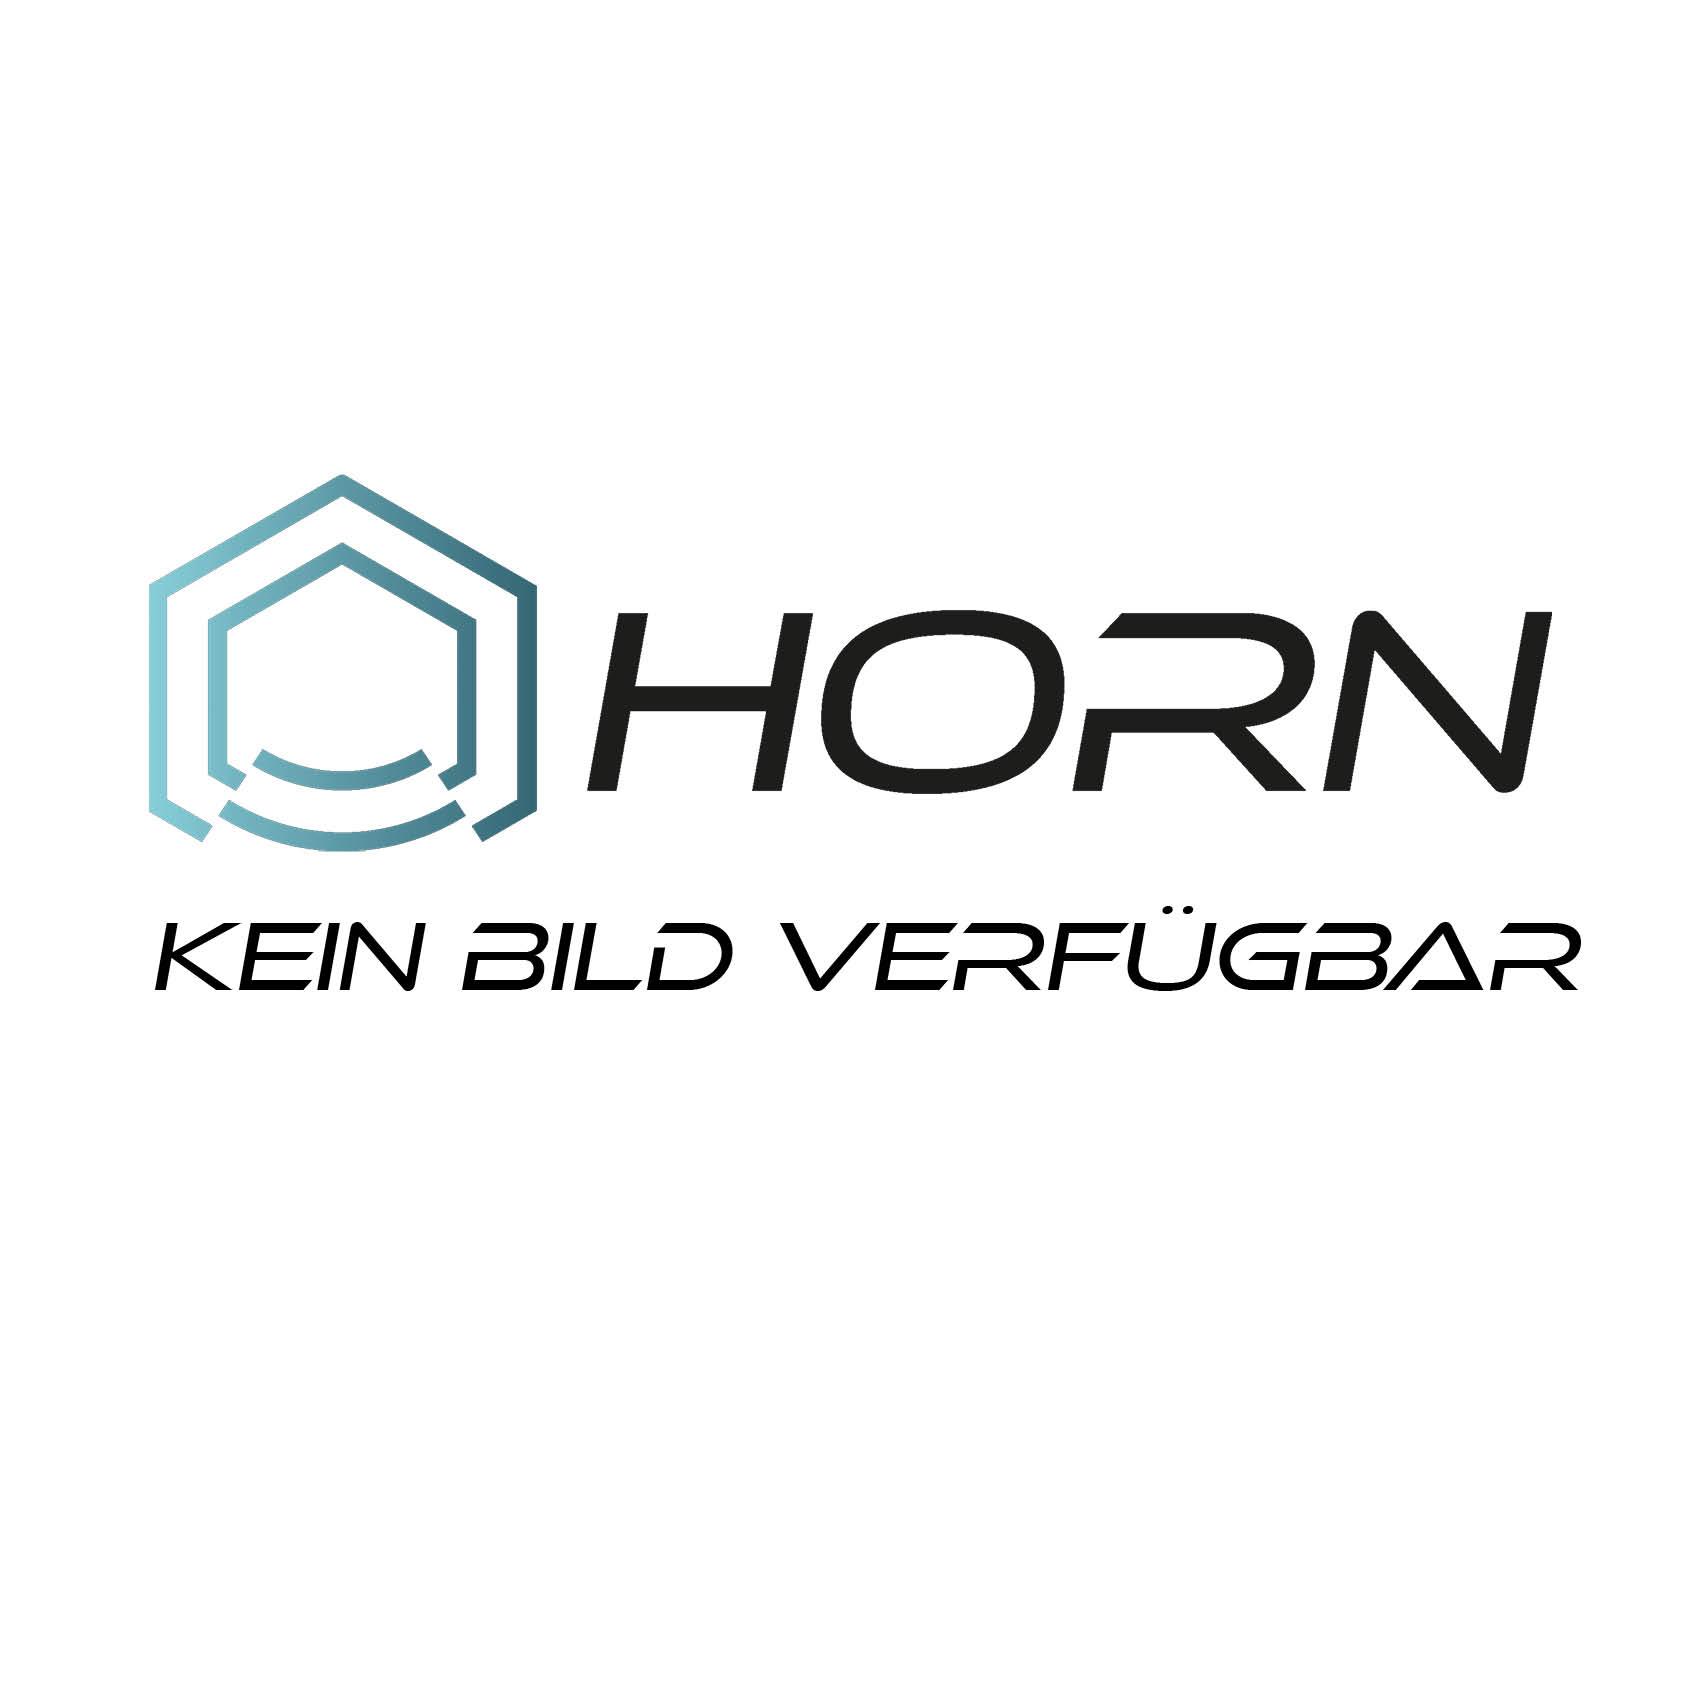 horn online optimum kreuztisch kreuzsupport kt 120 400x120mm max 40kg 3356595 optimum. Black Bedroom Furniture Sets. Home Design Ideas